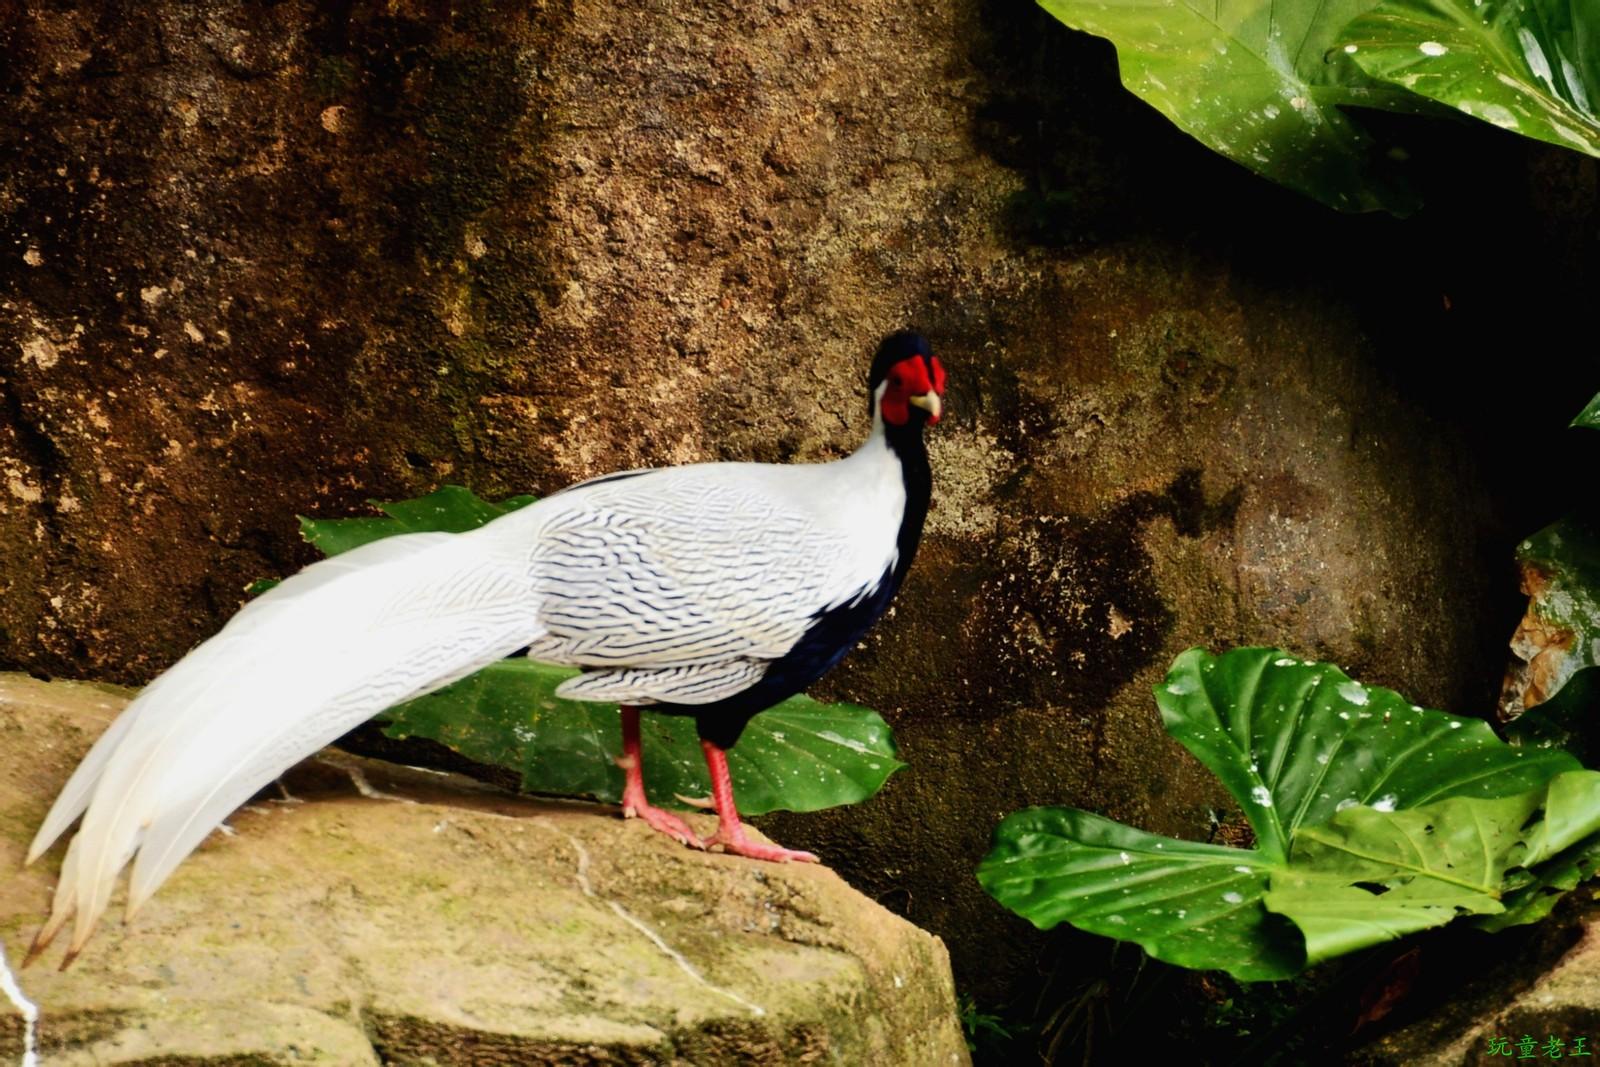 �y��9��h���9/g9��_白鹇(学名:lophura nycthemera),又名银鸡,越禽,白鹇鸡,白雉,雗,鵫雉